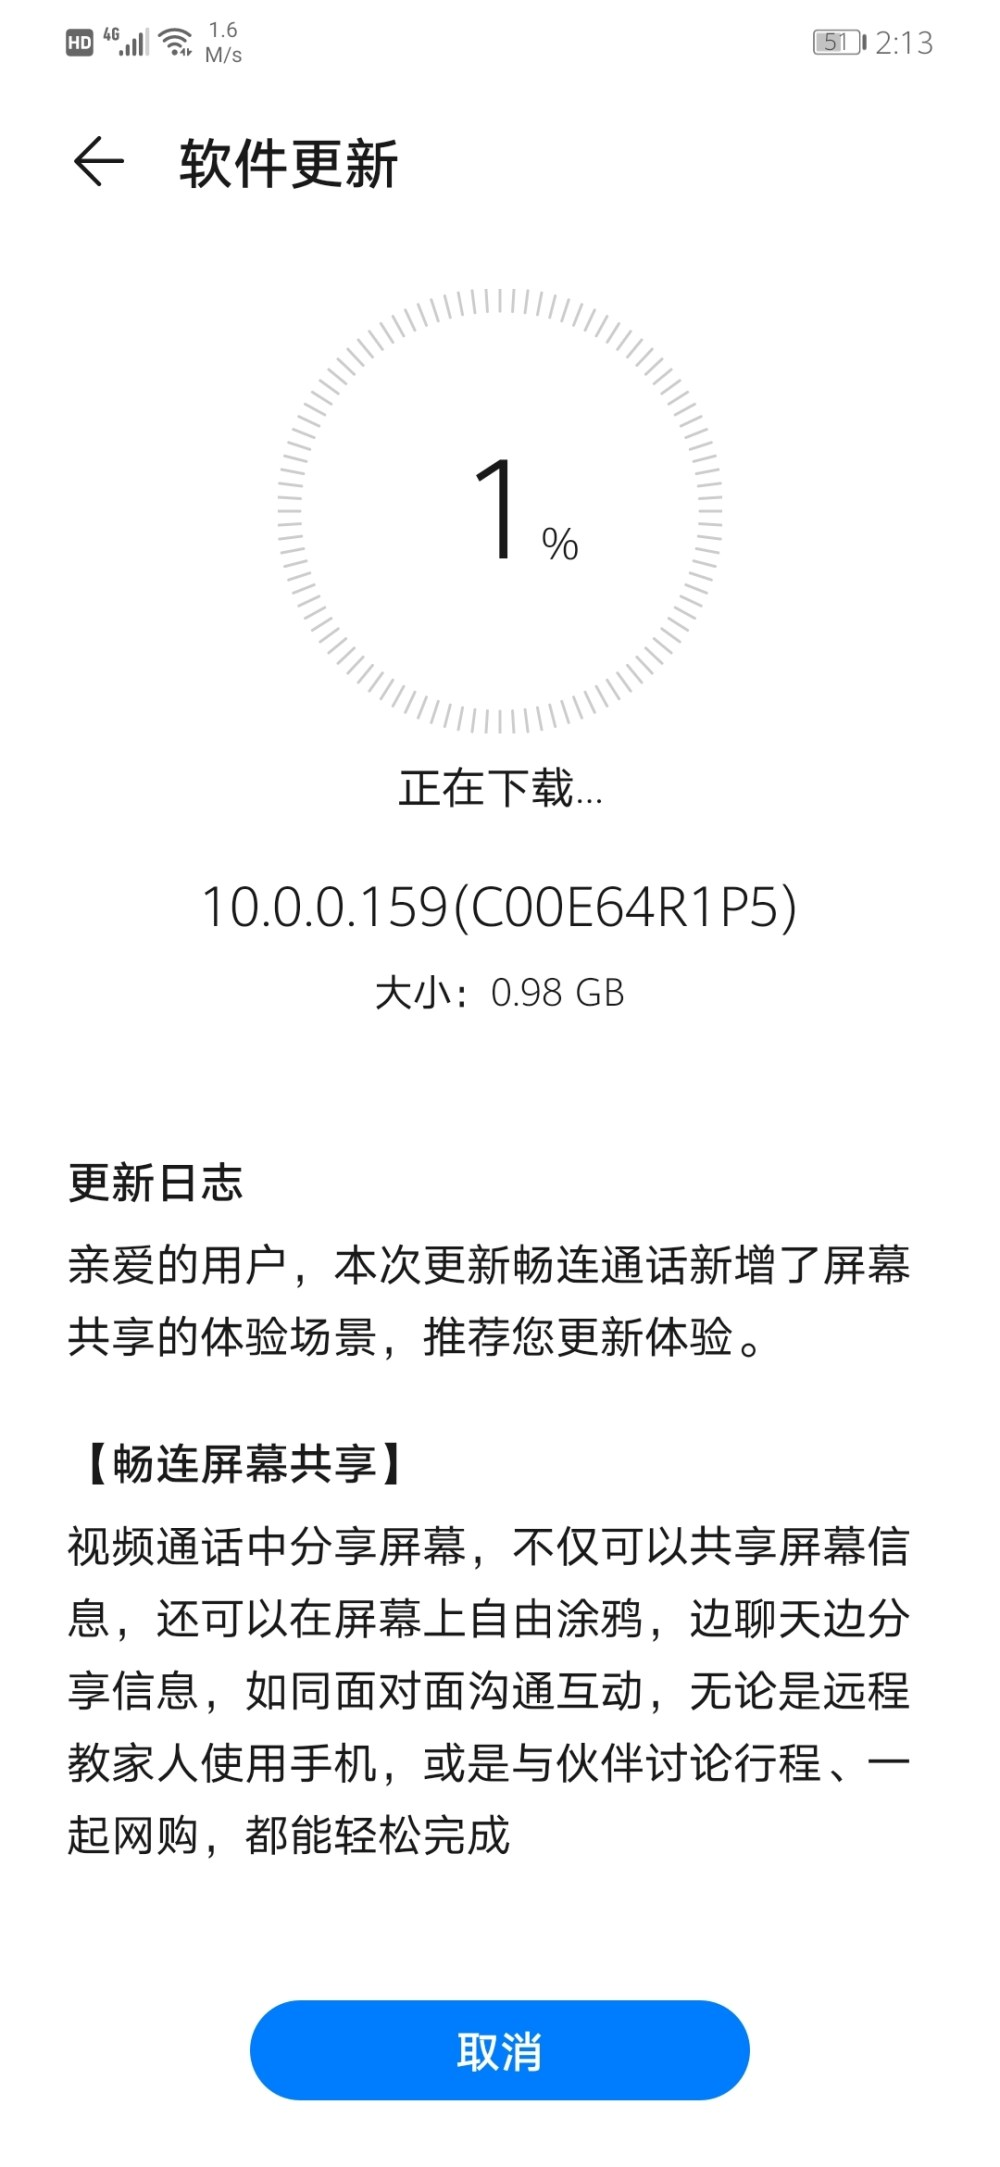 Huawei Maimang 7 EMUI 10.0.0.159 update